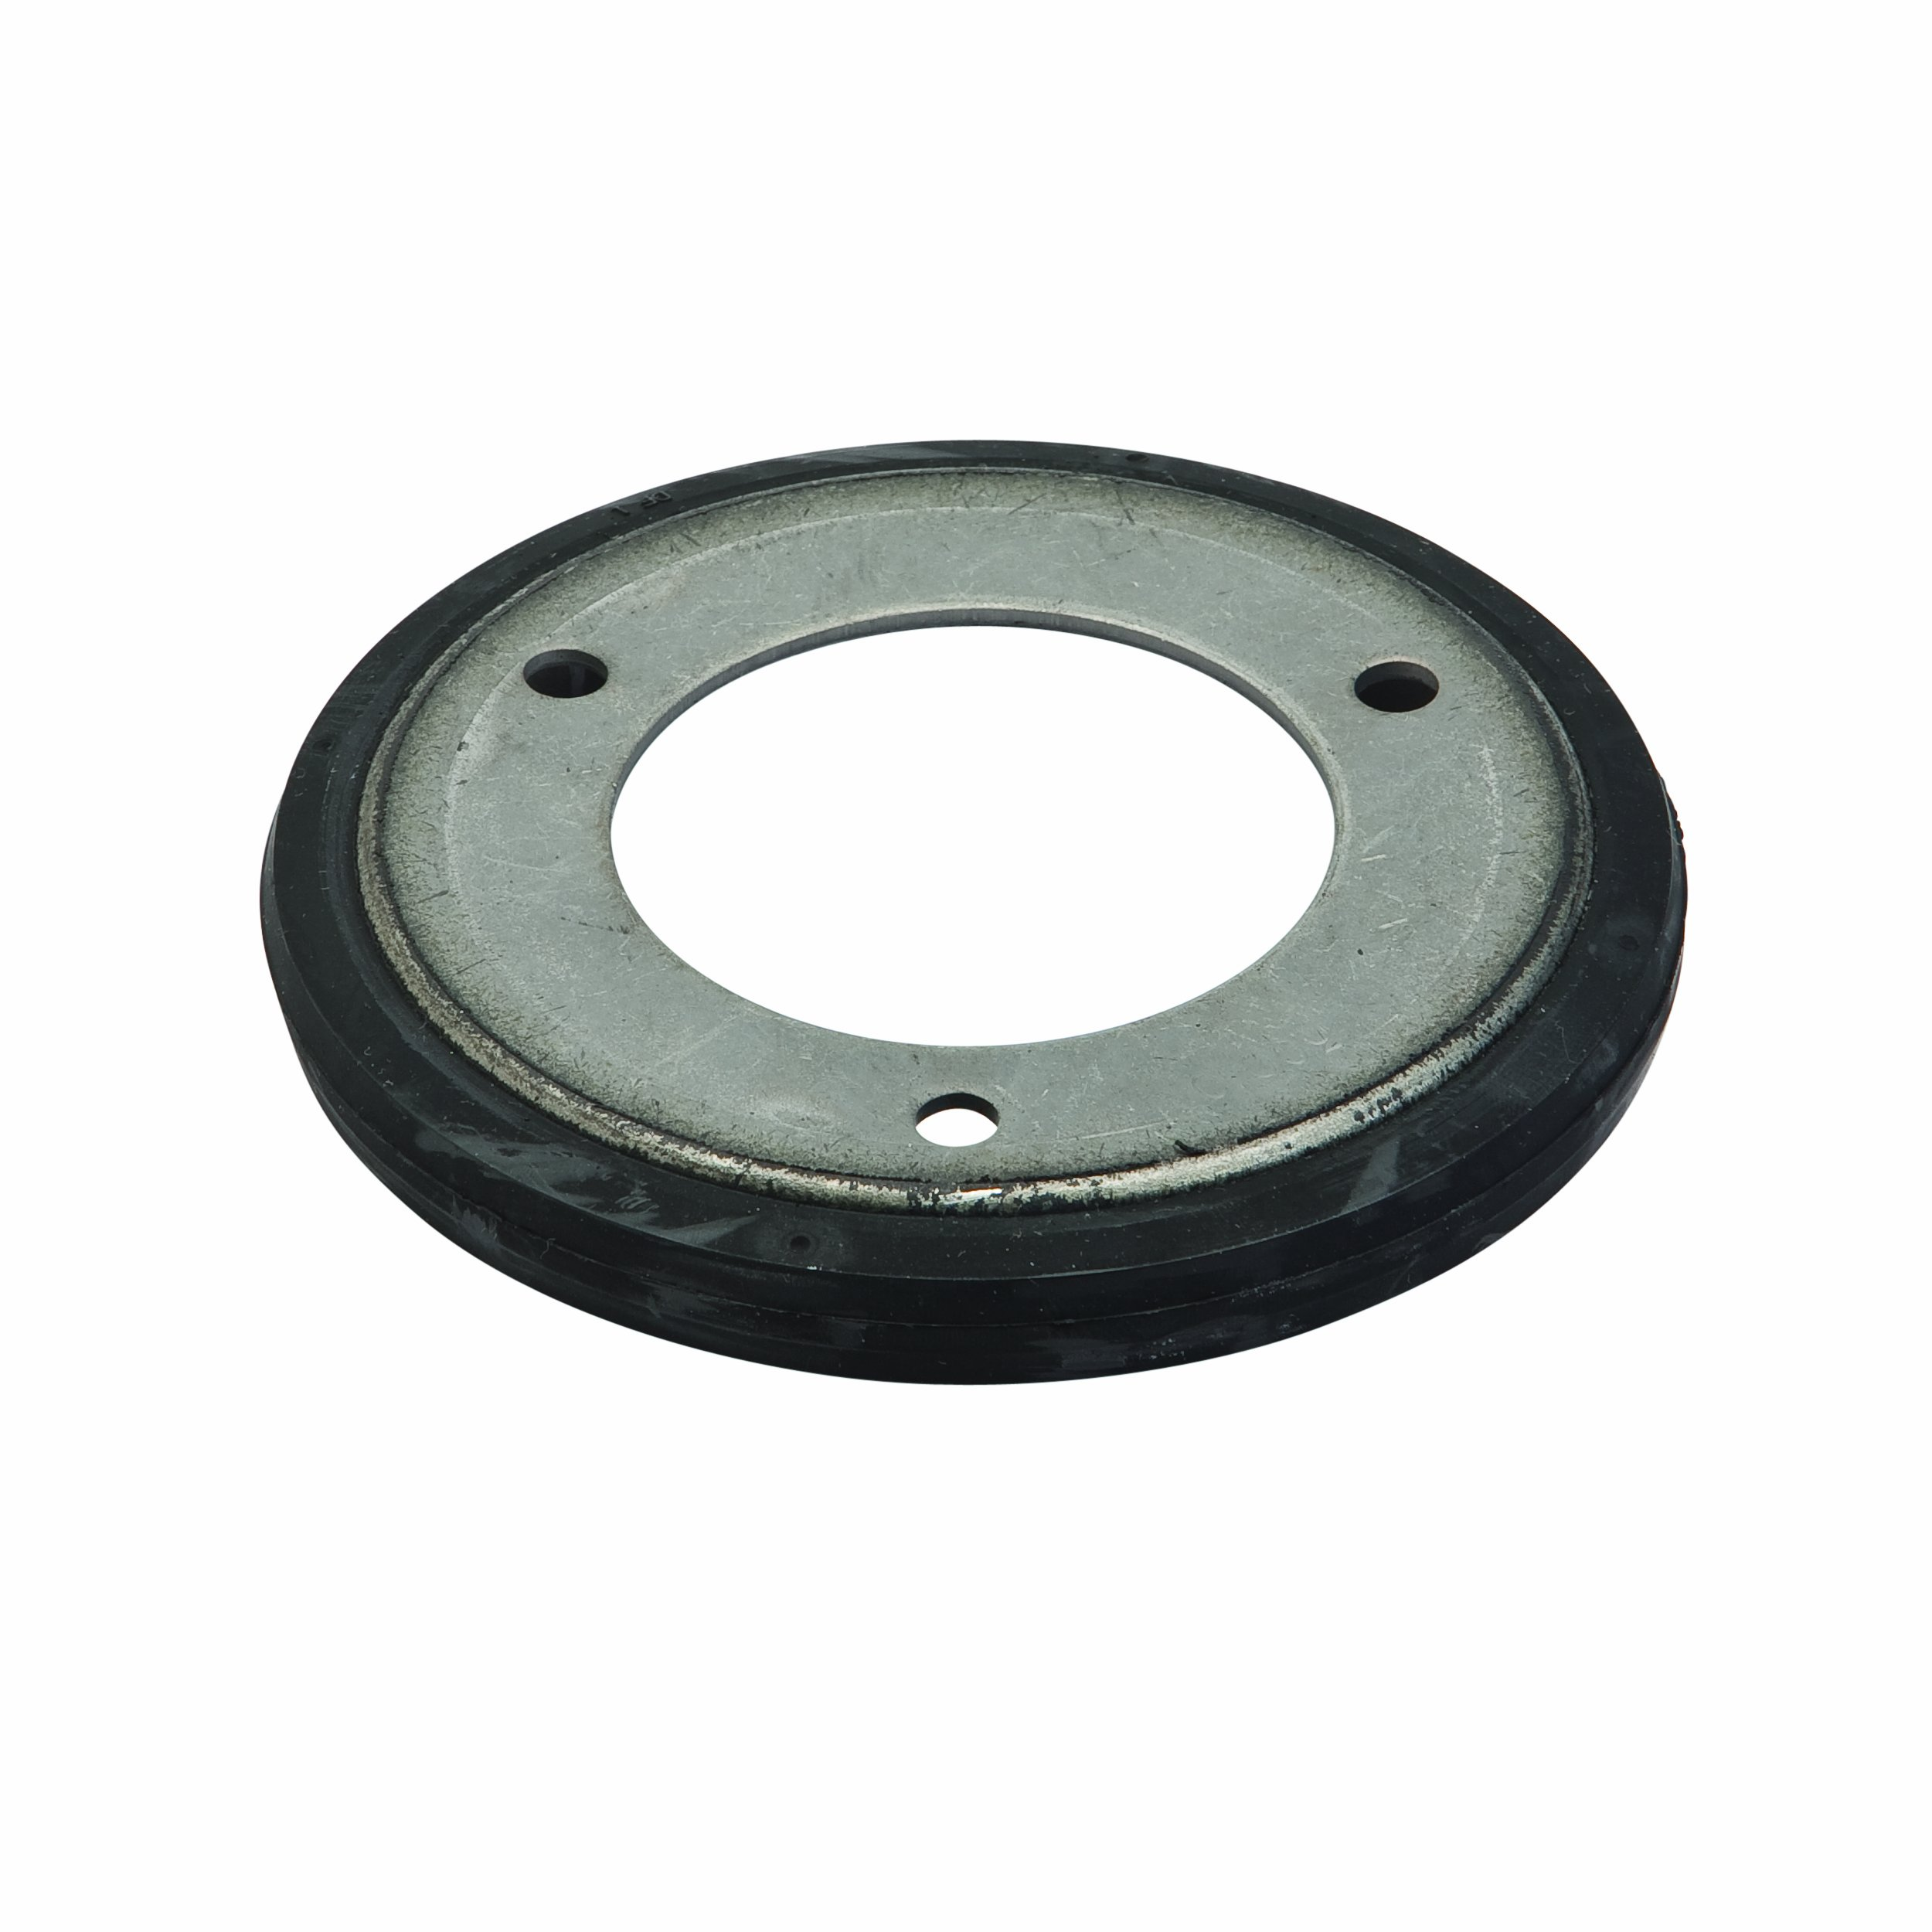 Oregon 76-070-0 Drive Disc Replacement for Ariens 22013, John Deere AM12355